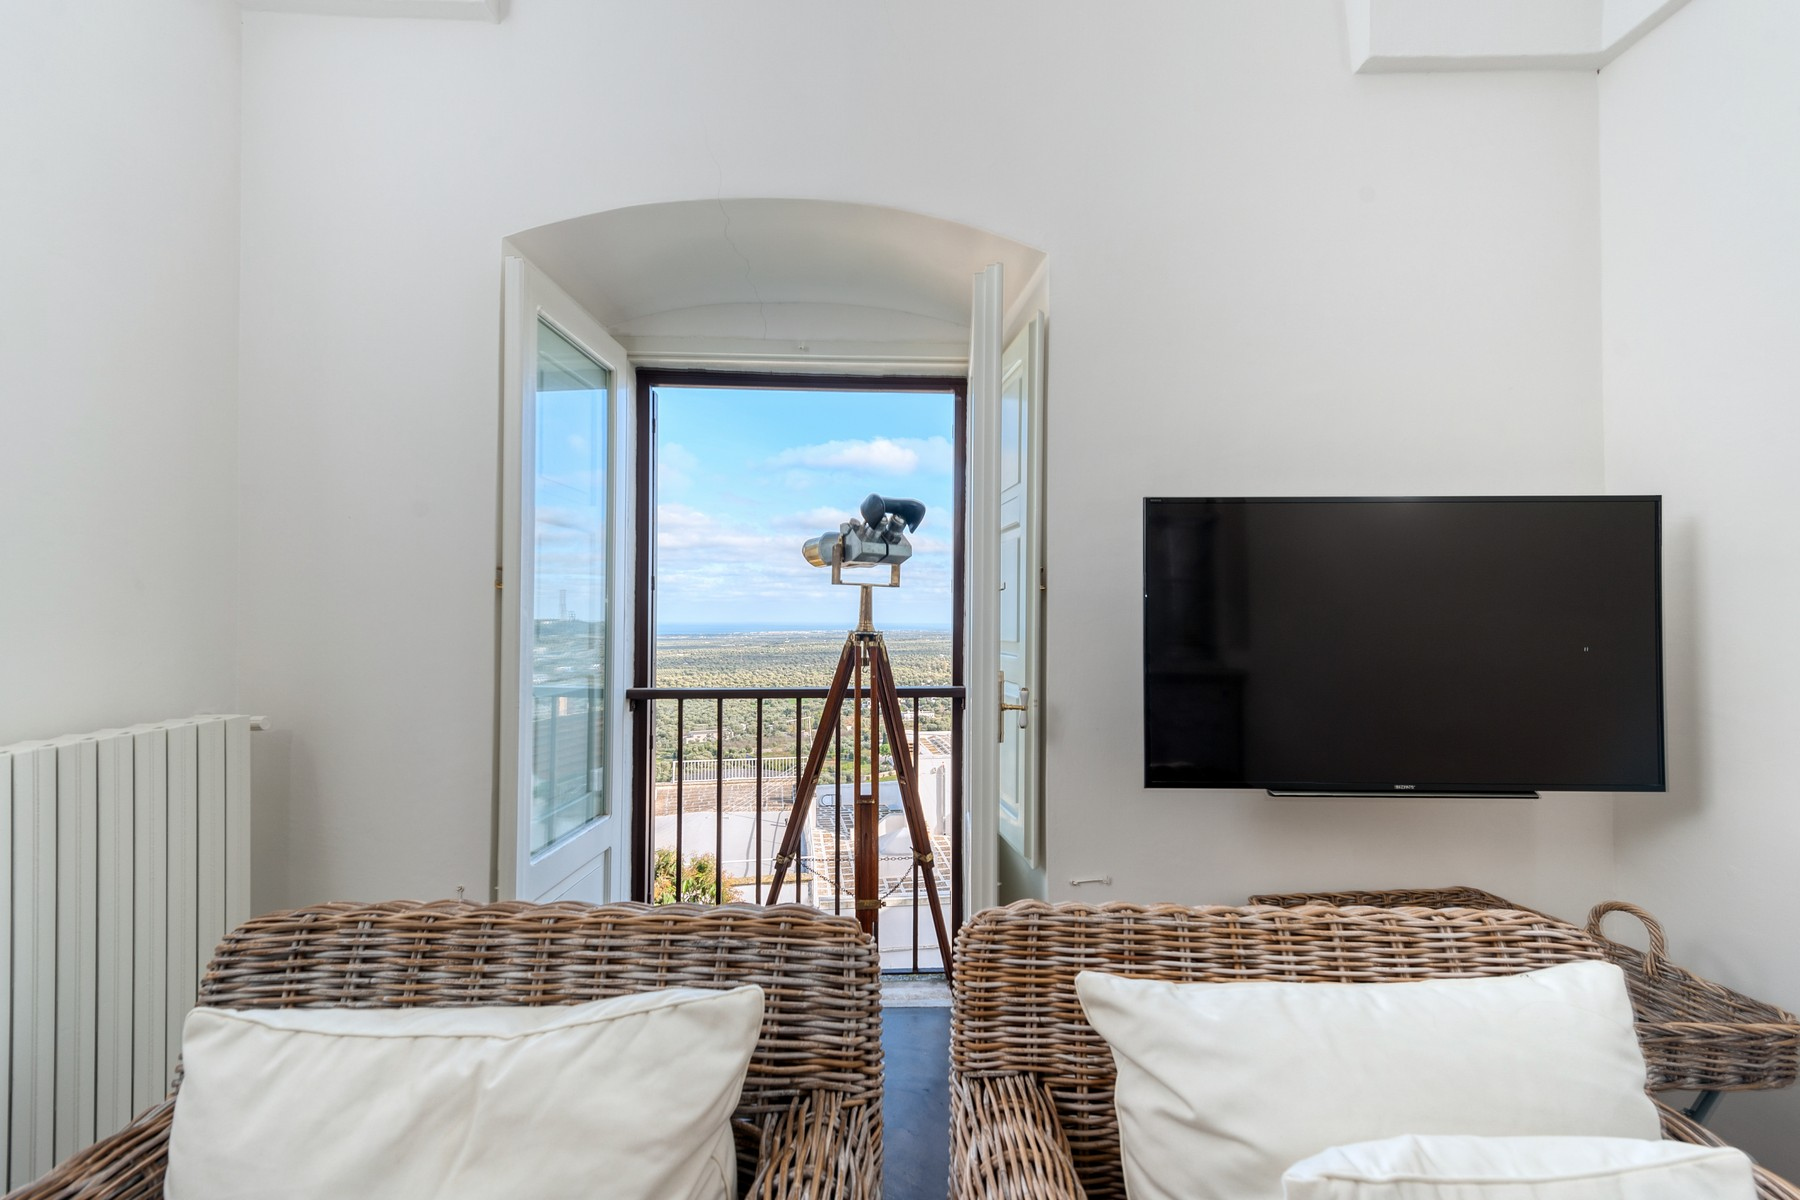 Appartamento in Vendita a Ostuni: 5 locali, 265 mq - Foto 6